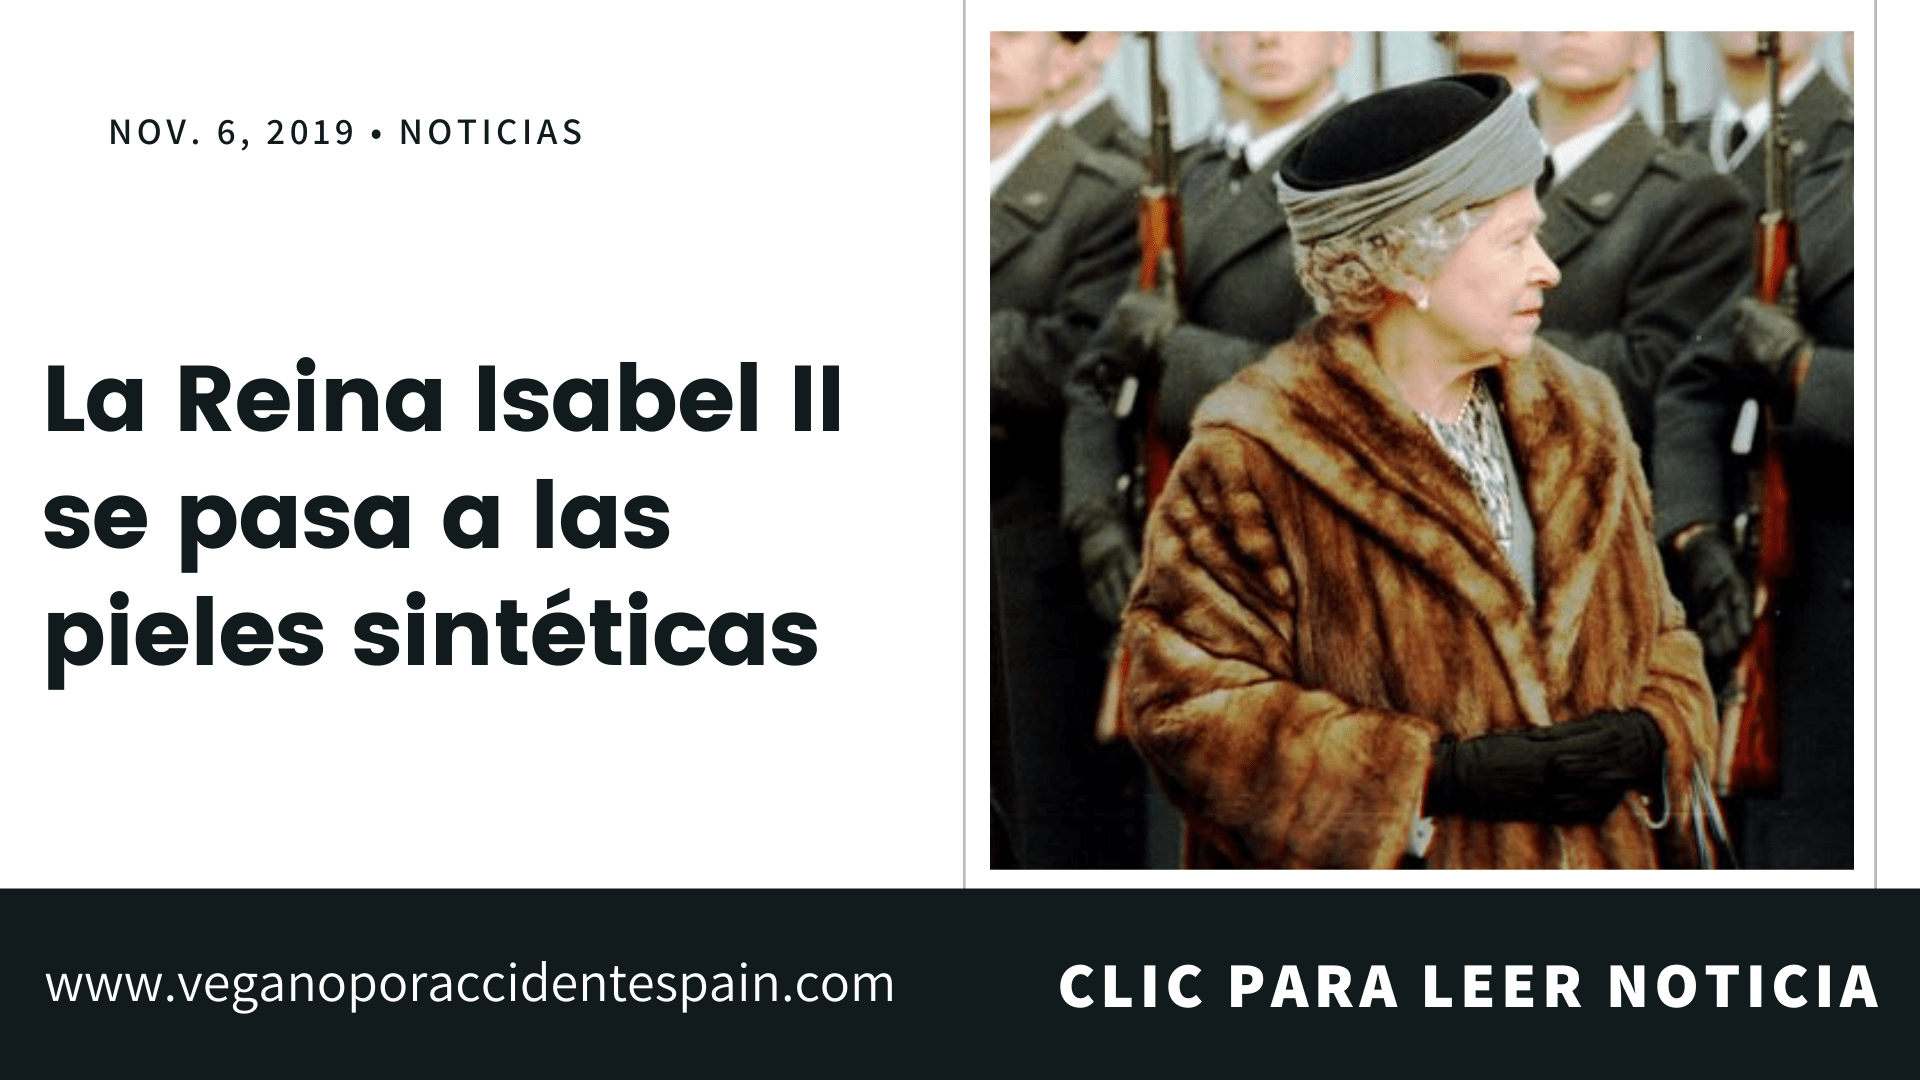 La Reina Isabel II deja las pieles